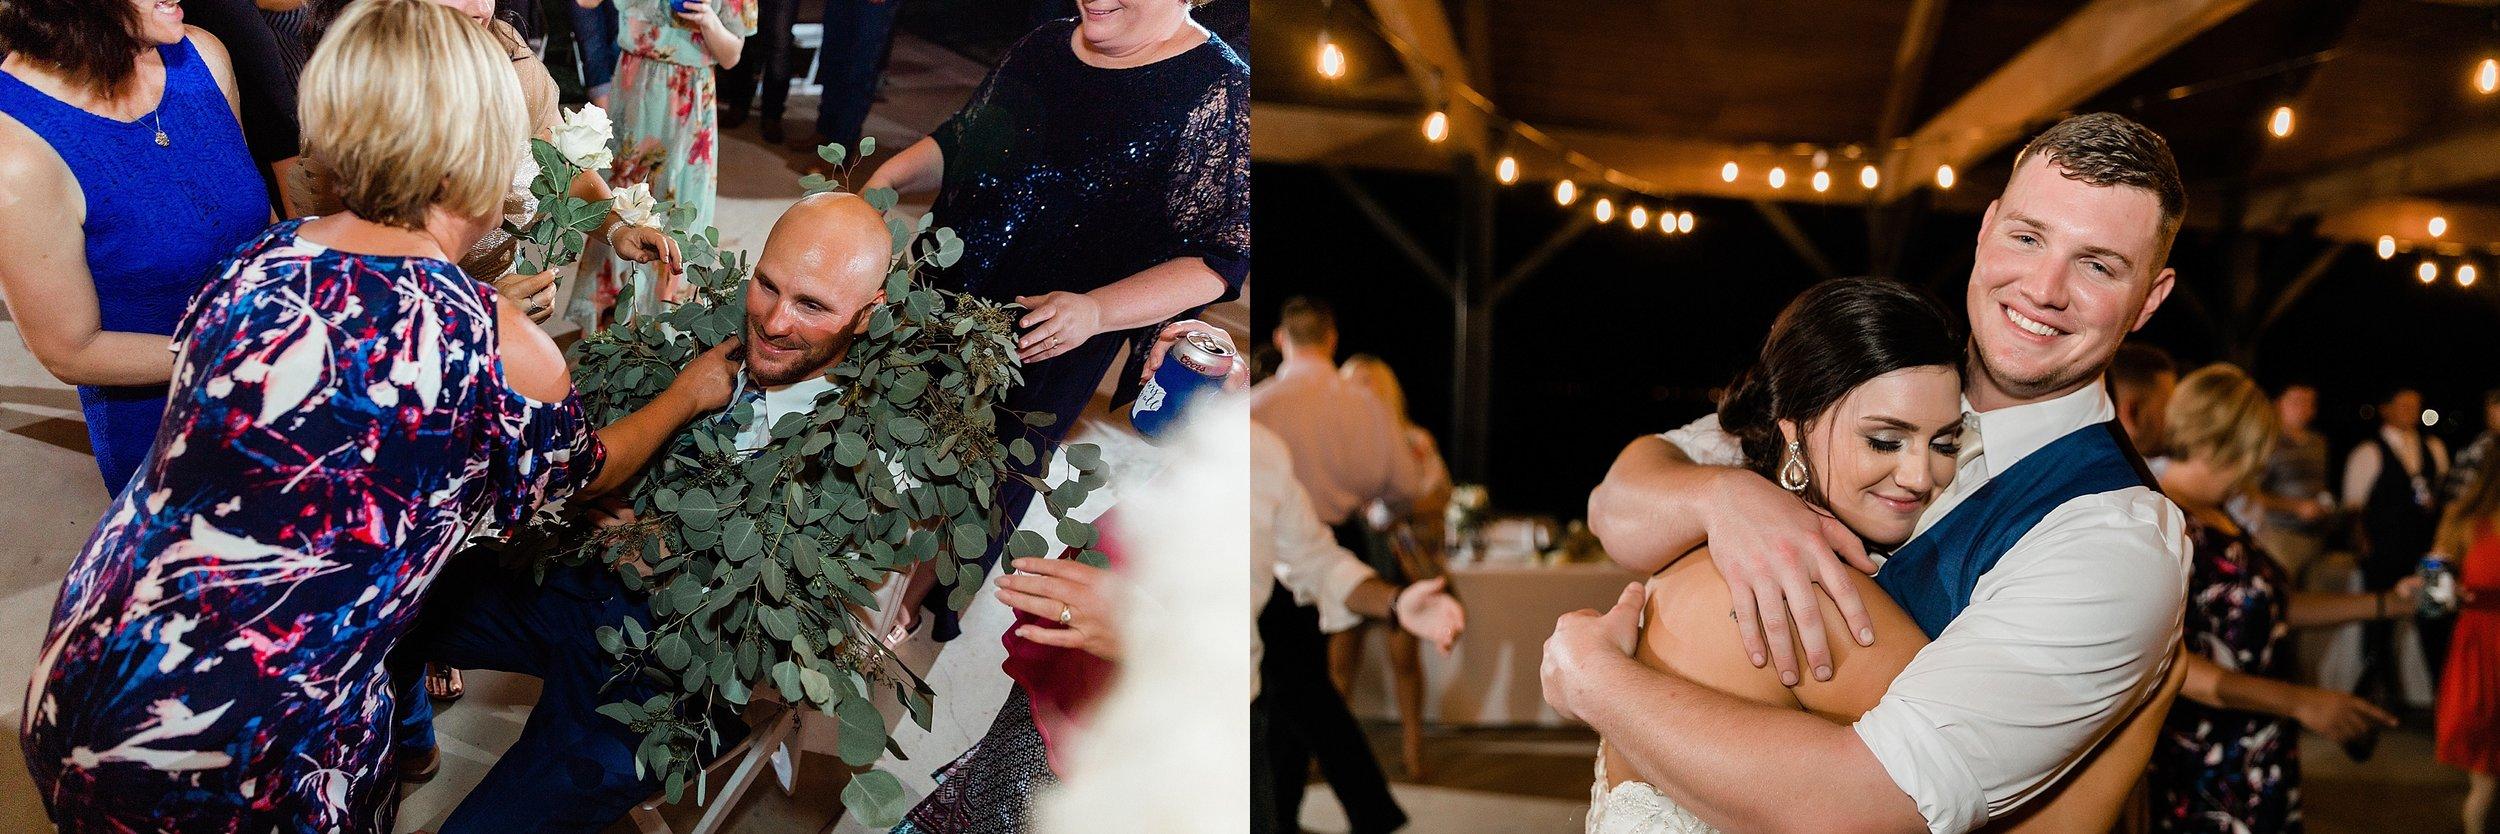 bailey-and-carl-coyote-ranch-resort-wedding-photographer-wichita-falls-texas-destination-wedding-0068.jpg